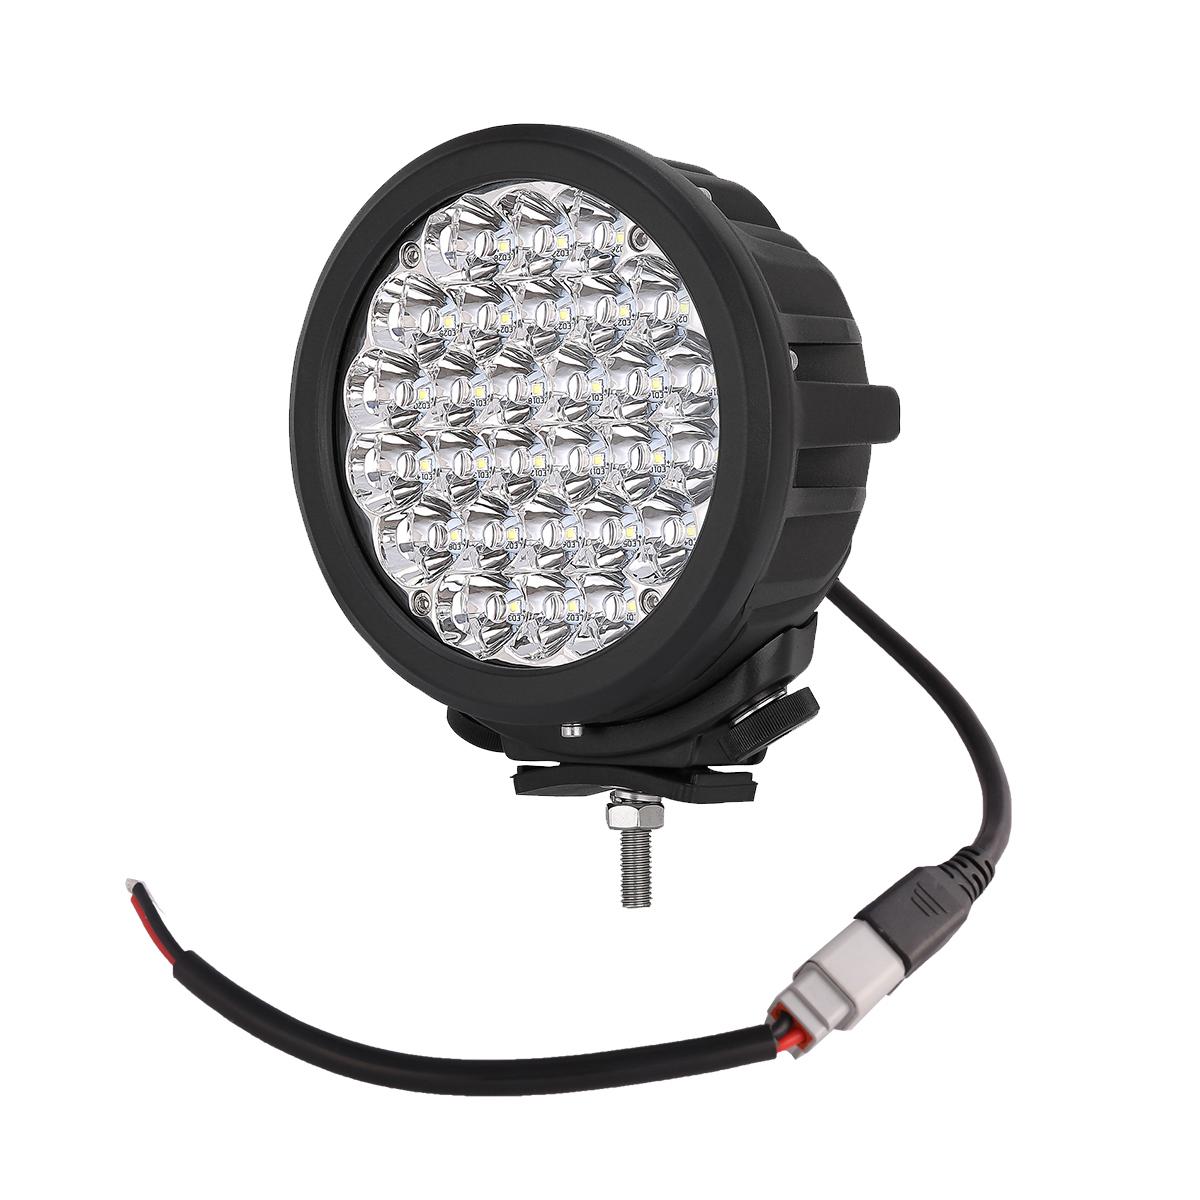 2x 7 U0026quot  Inch 140w Led Offroad Lights Spot Driving Work Fog